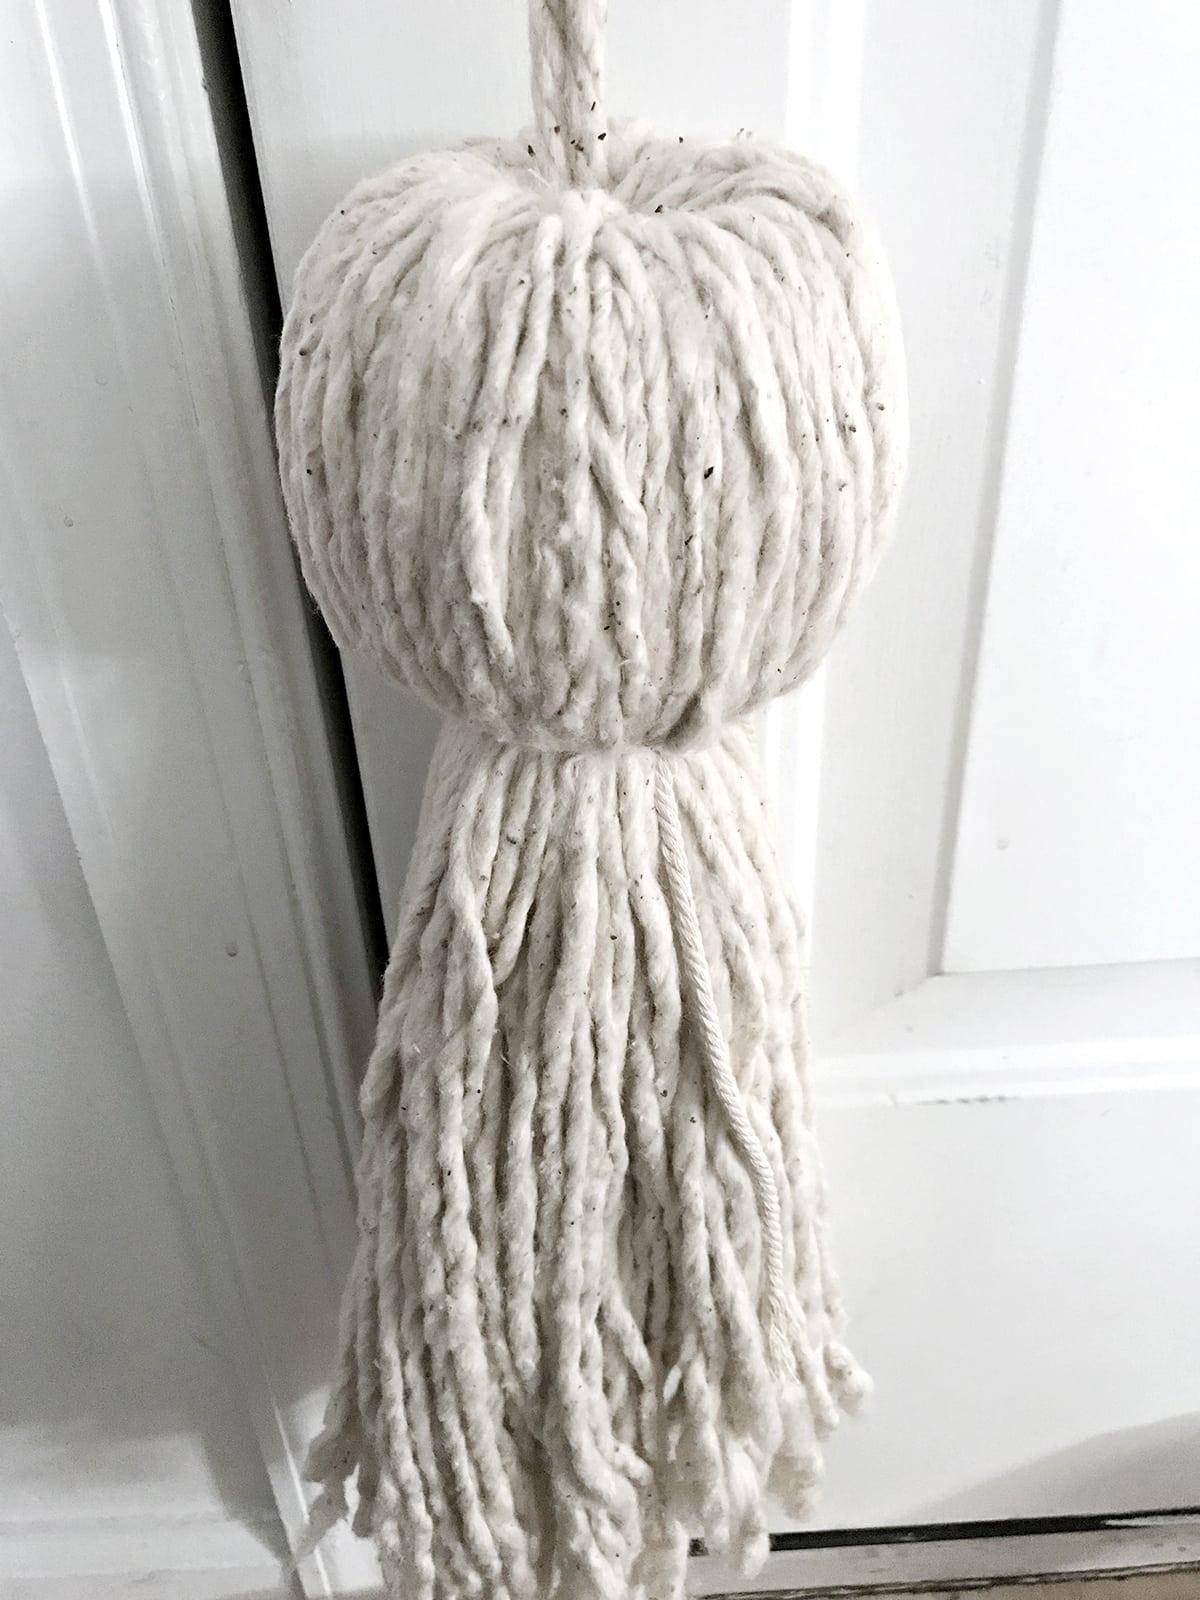 mop head needed to make a huge stylish tassel